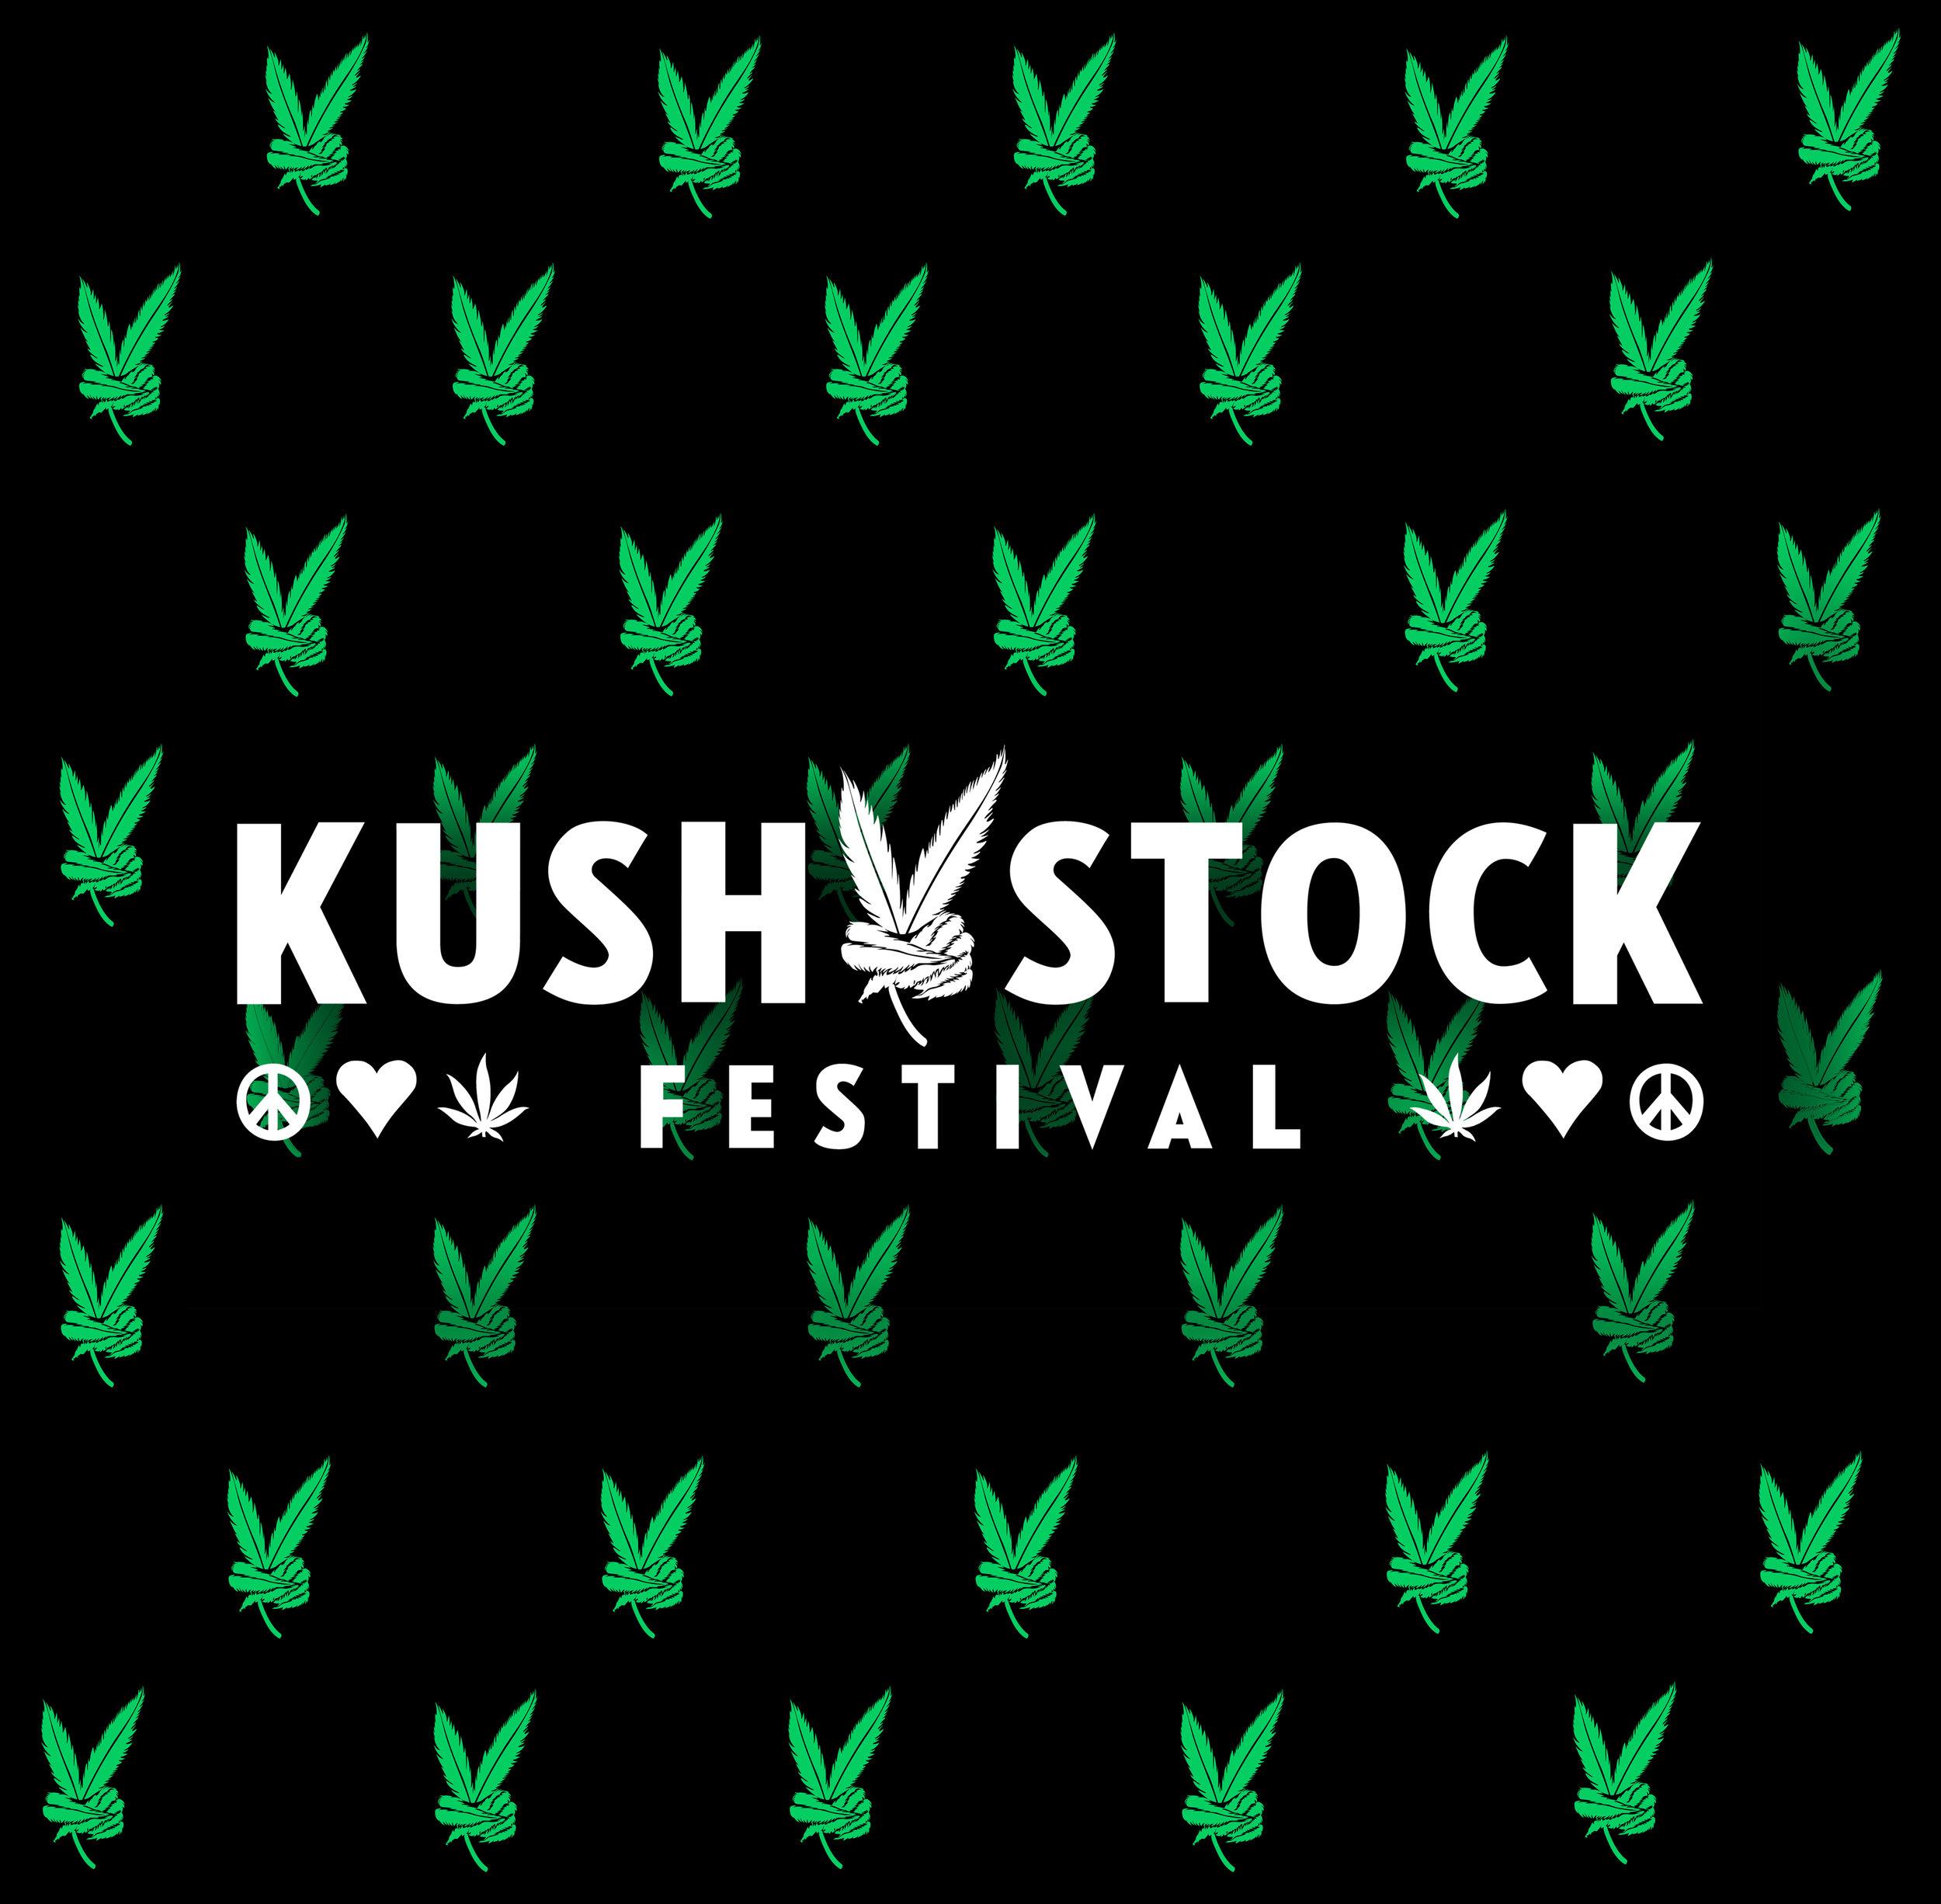 Kush Stock Las Vegas